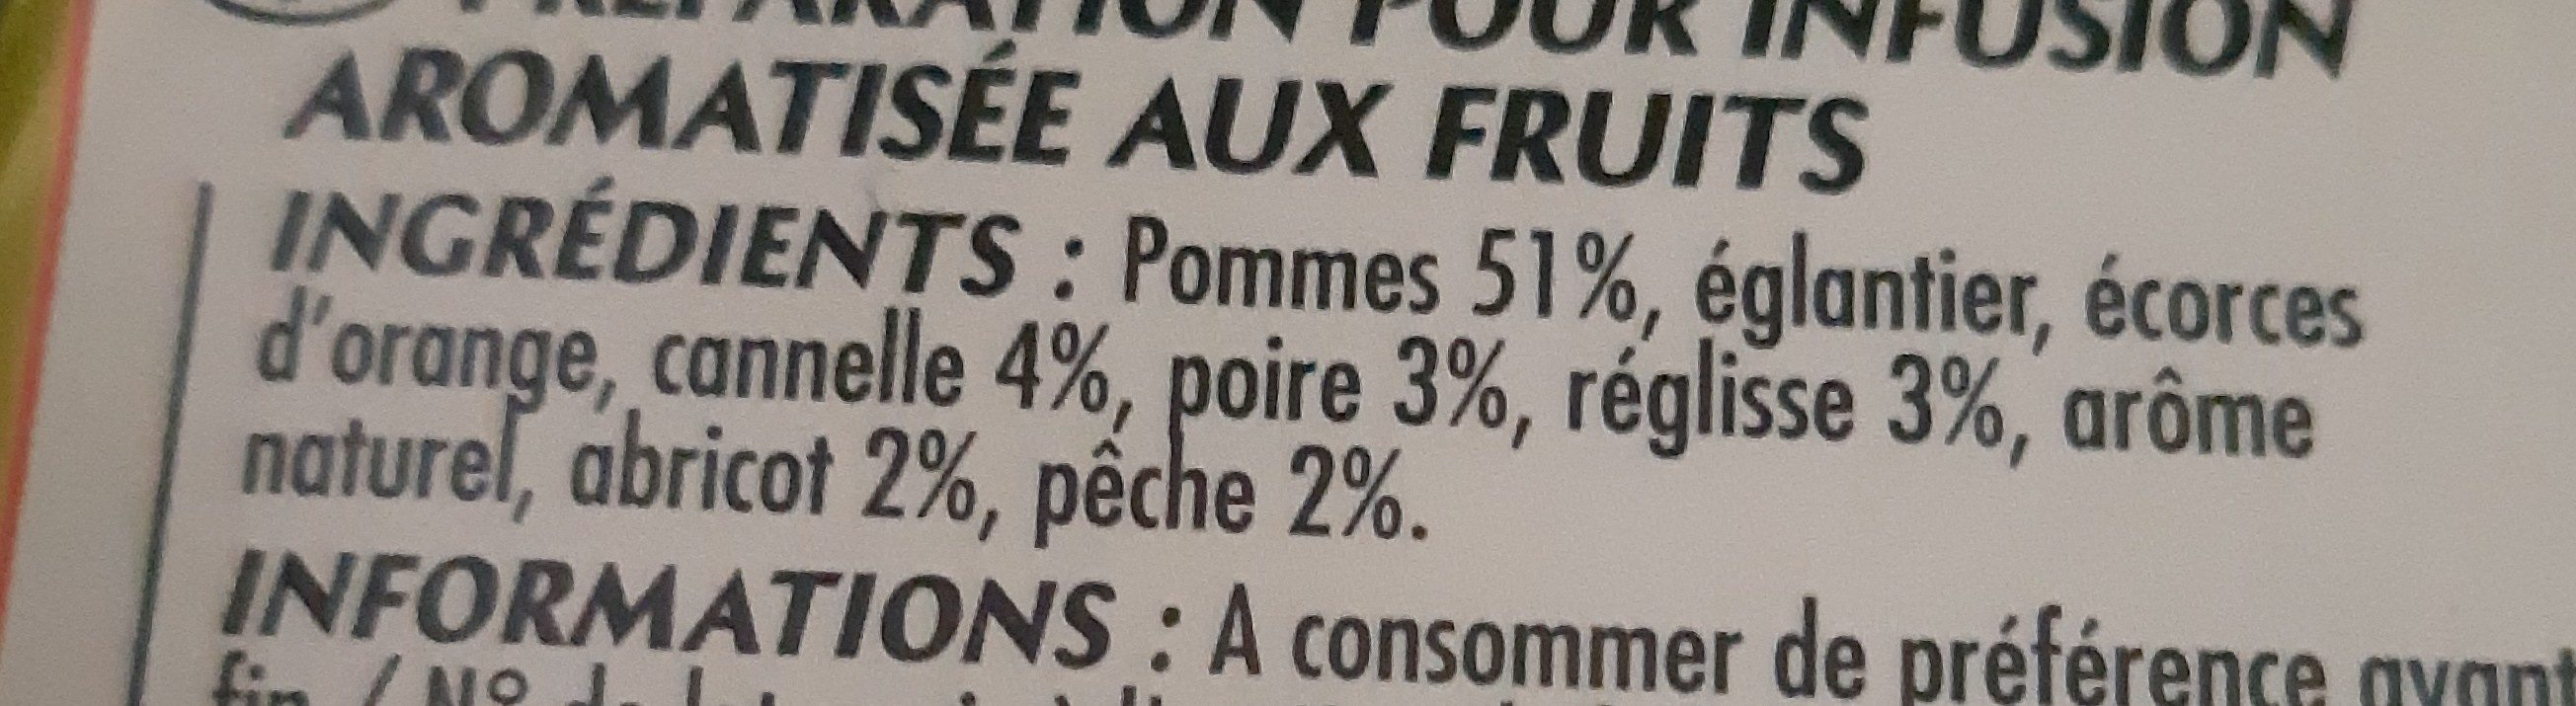 Infusion fruits du verger - Ingrediënten - fr